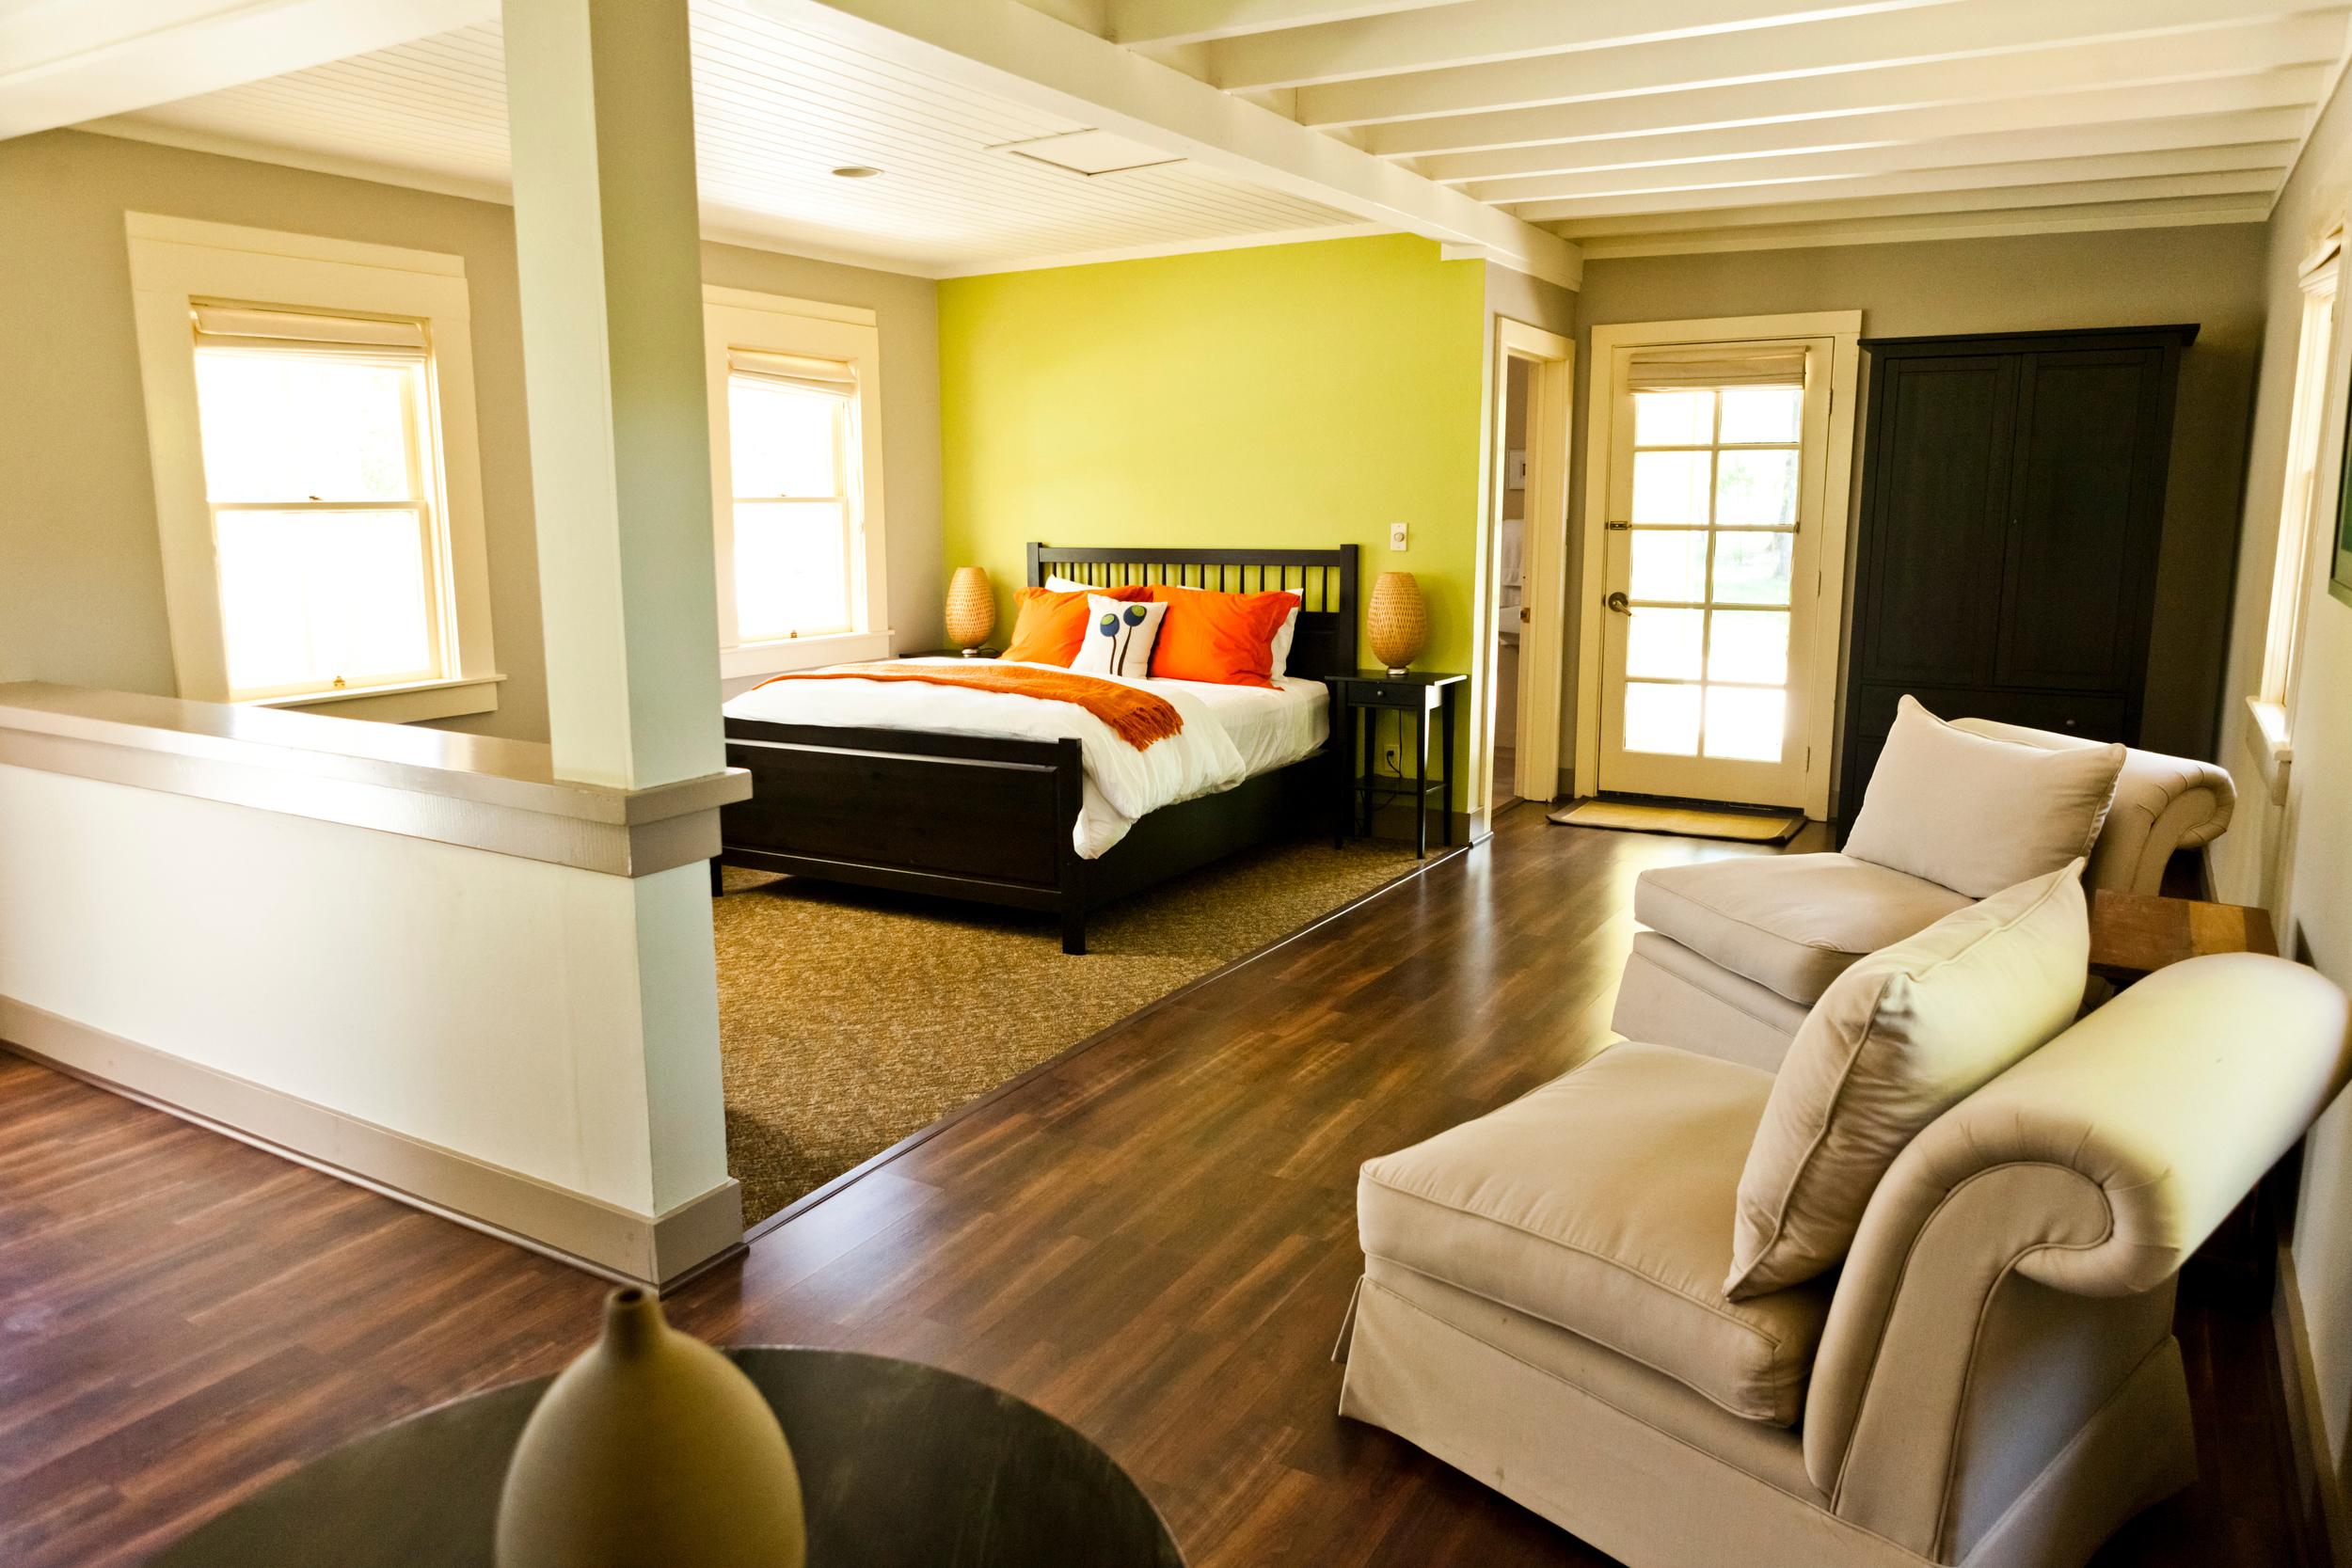 Accommodation cottage.jpg